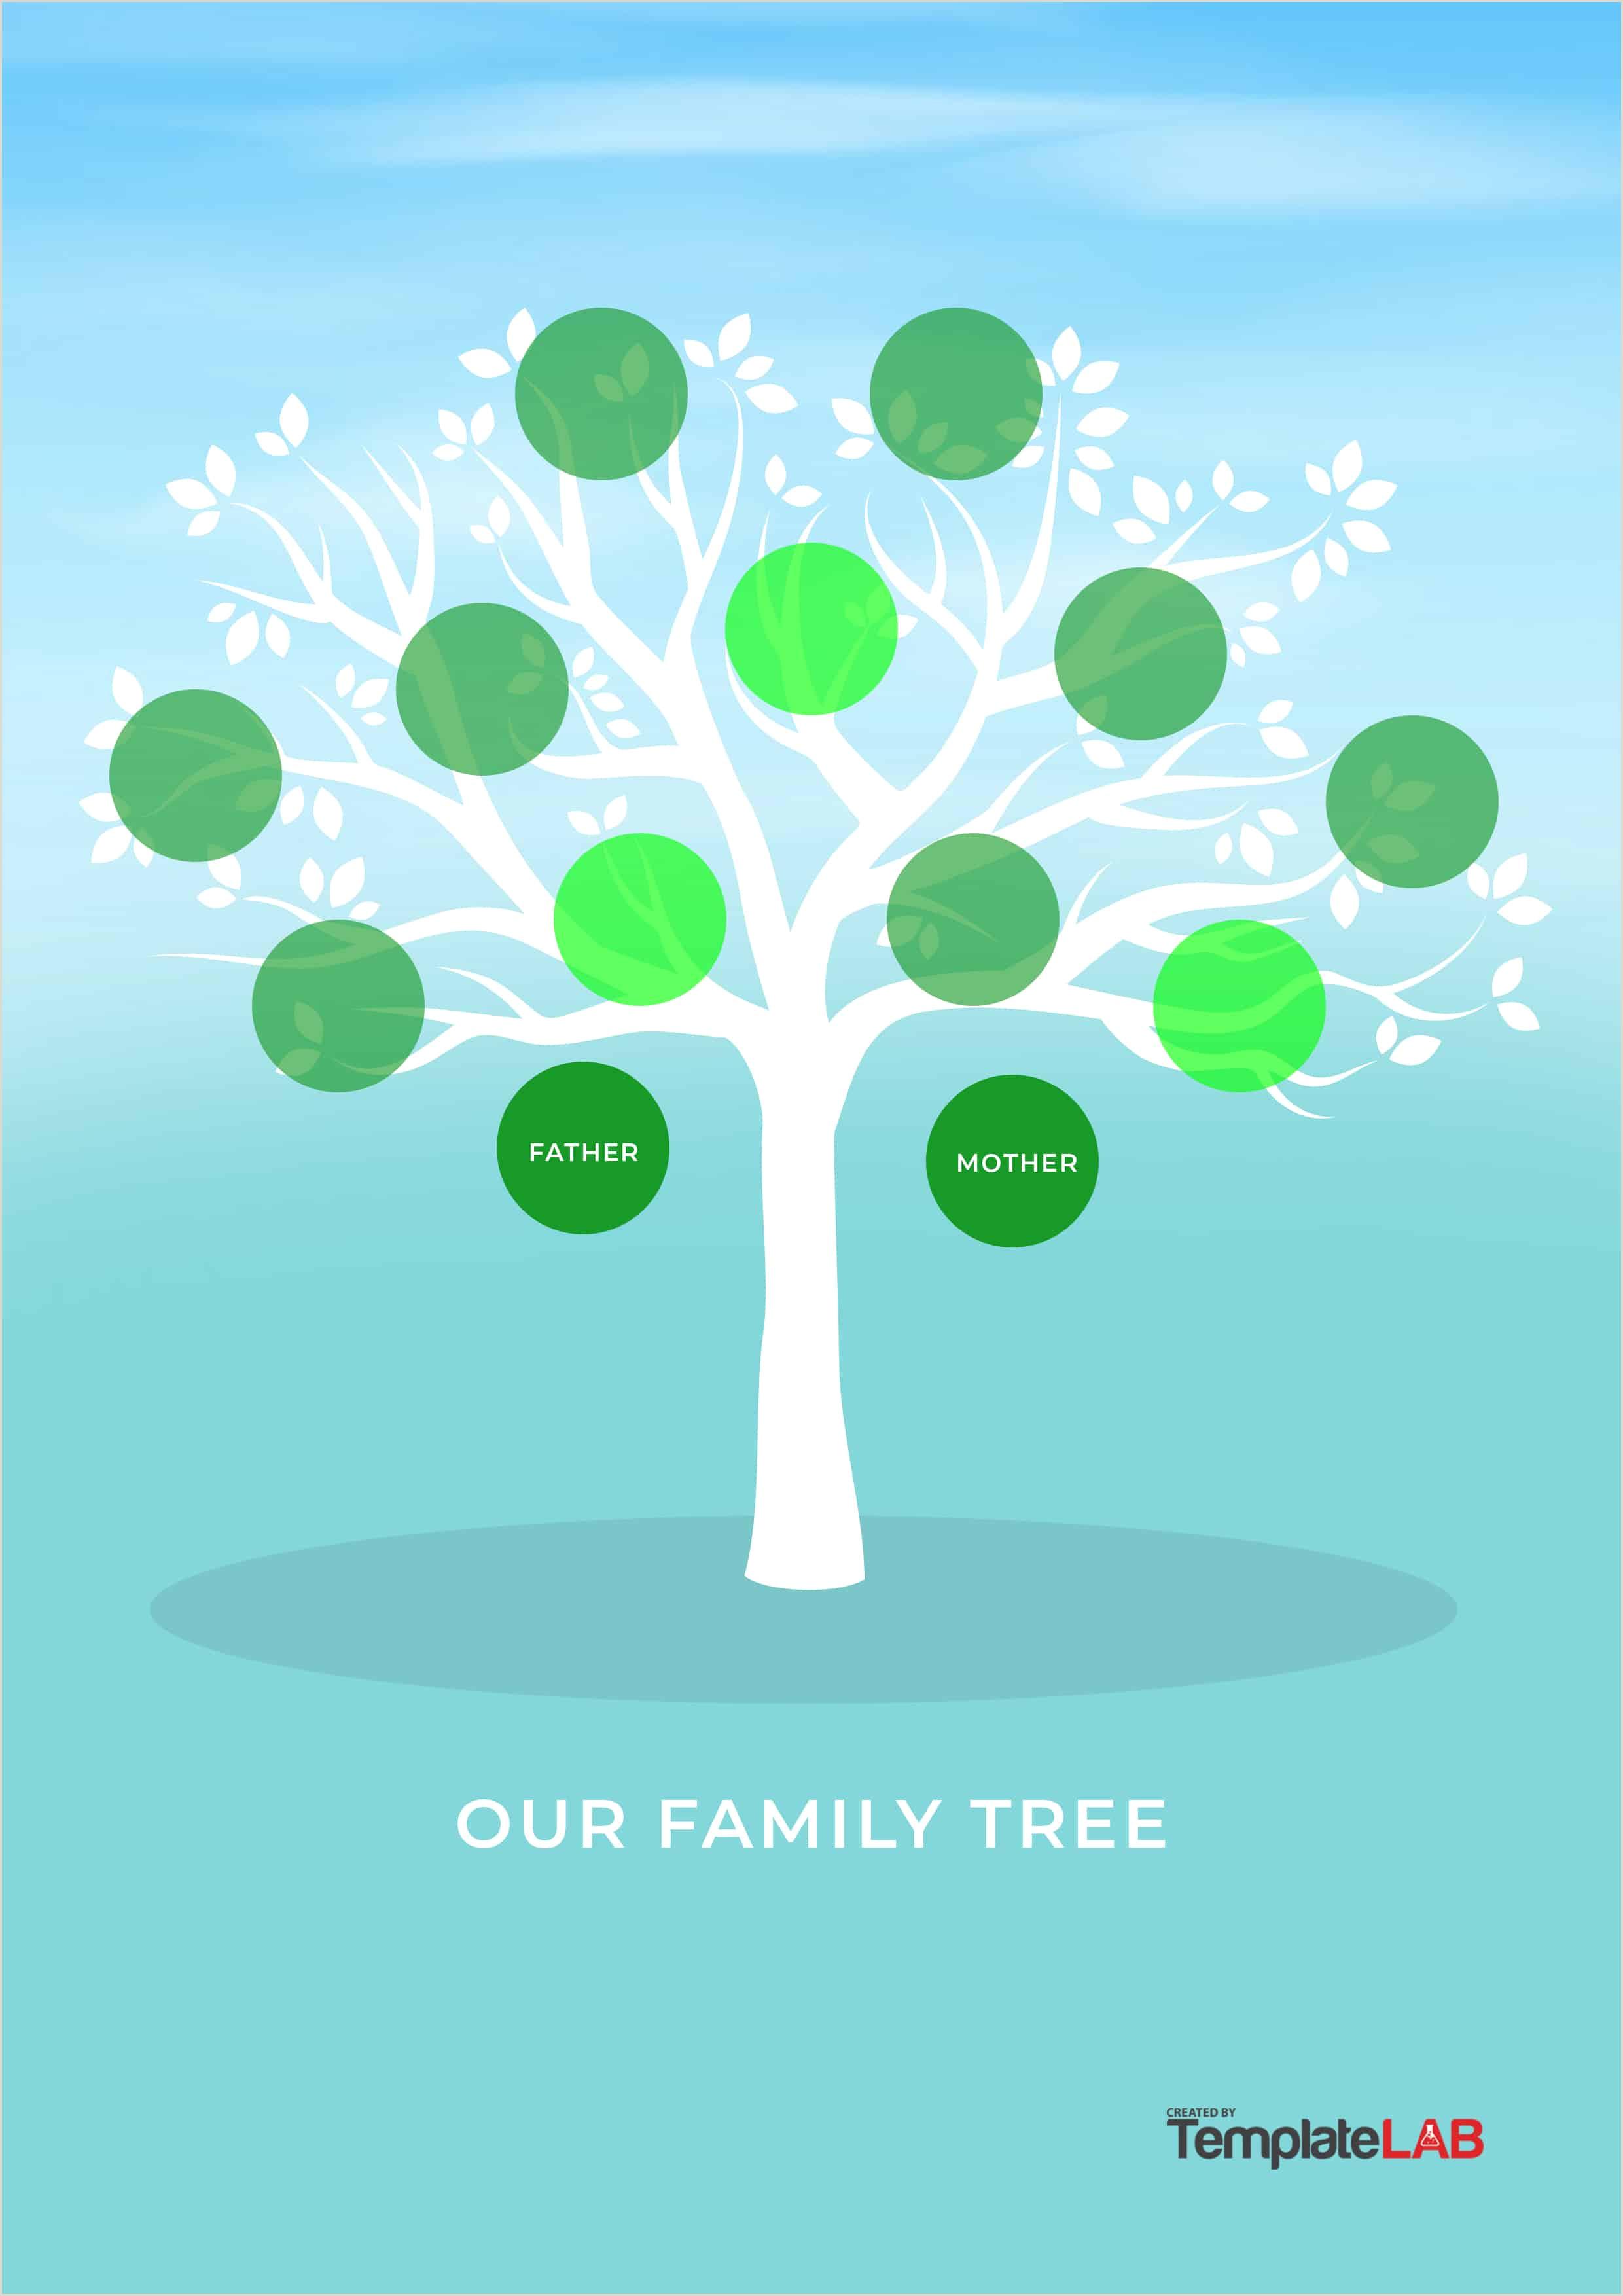 Printable Family Health History form 30 Free Genogram Templates & Symbols Template Lab